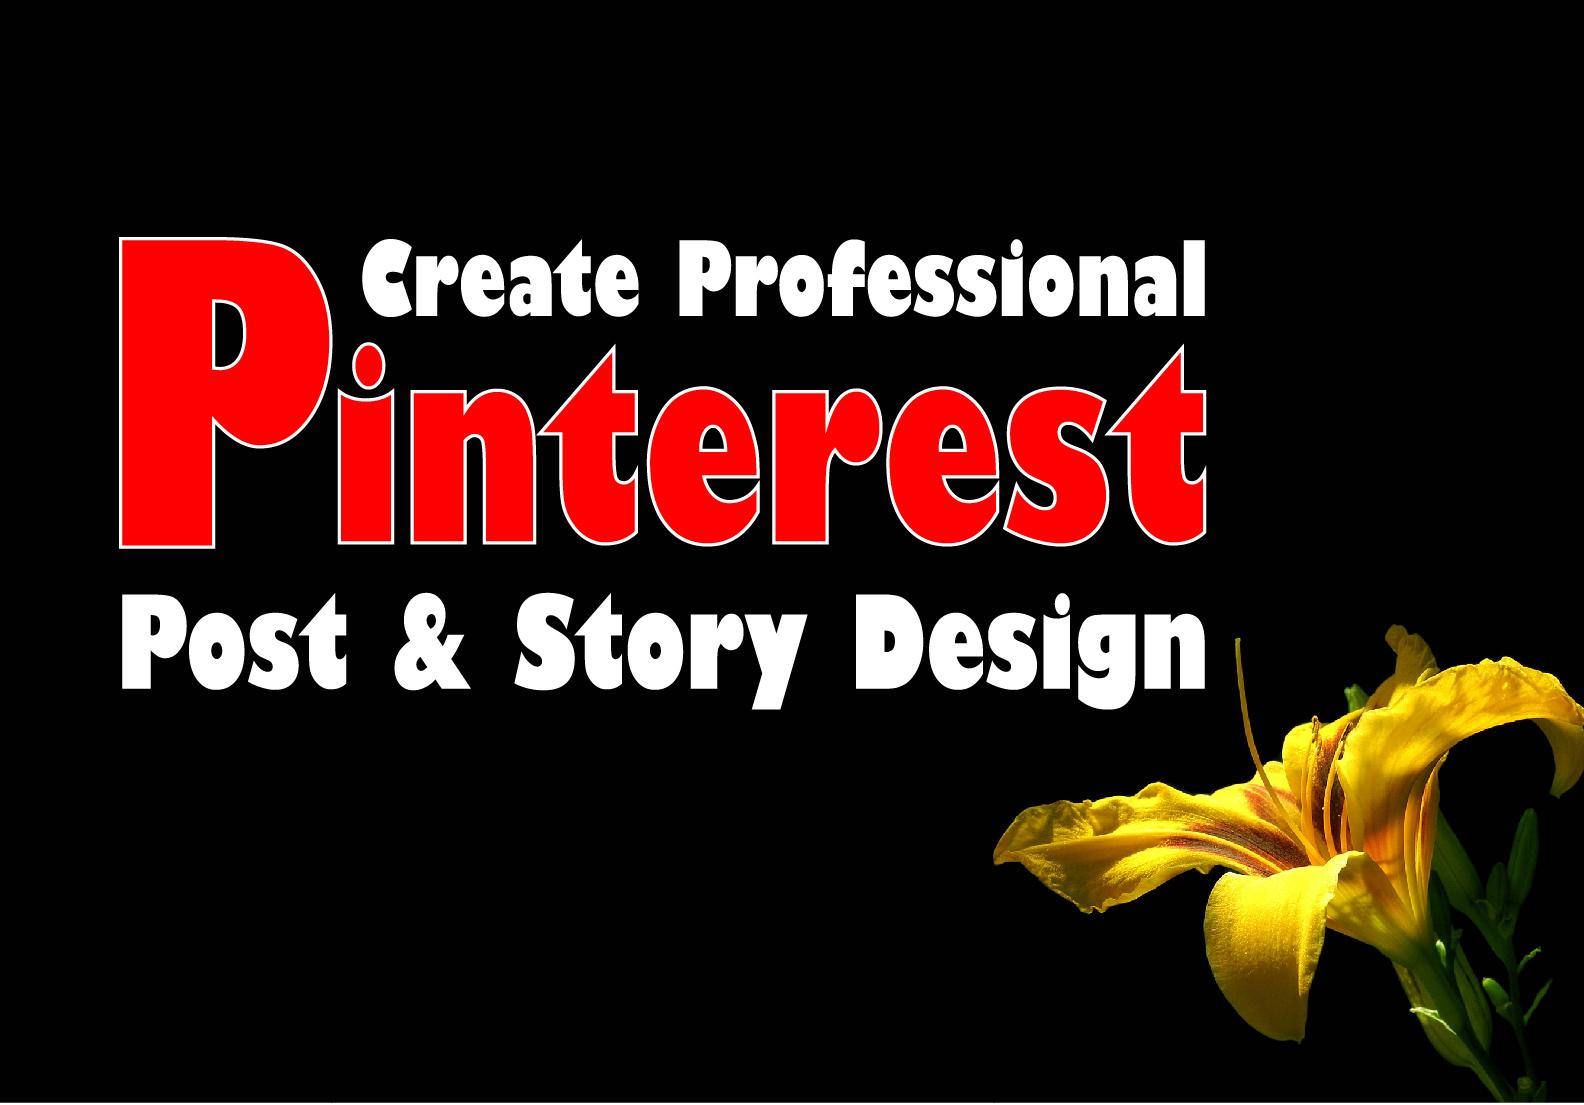 I will create professional Pinterest Post & Story Design